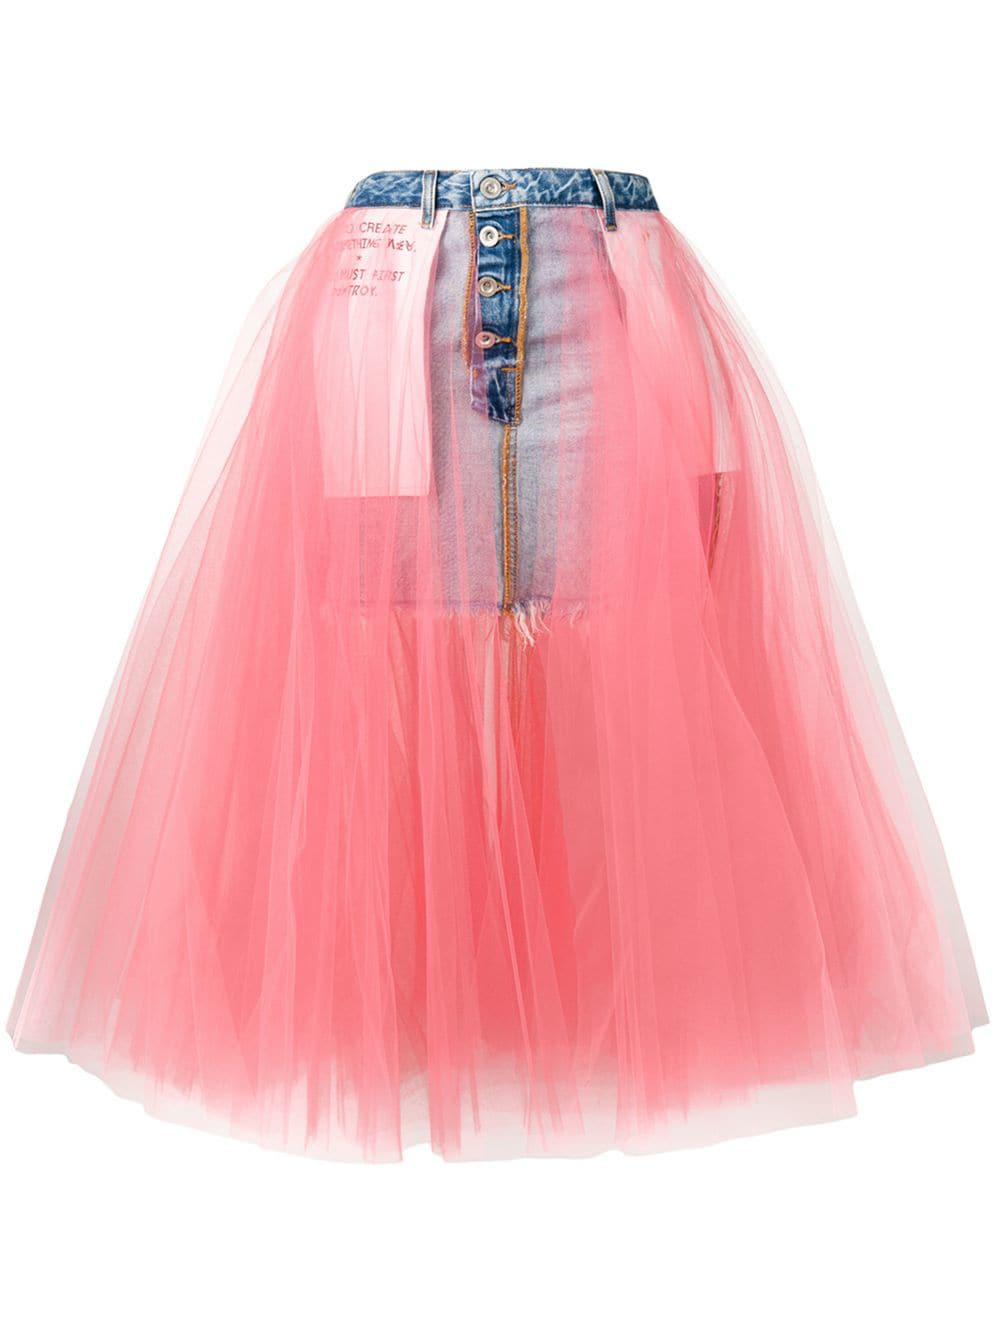 0c3516e54 Shop Ben Taverniti Unravel Project Skirts for Women | ModeSens